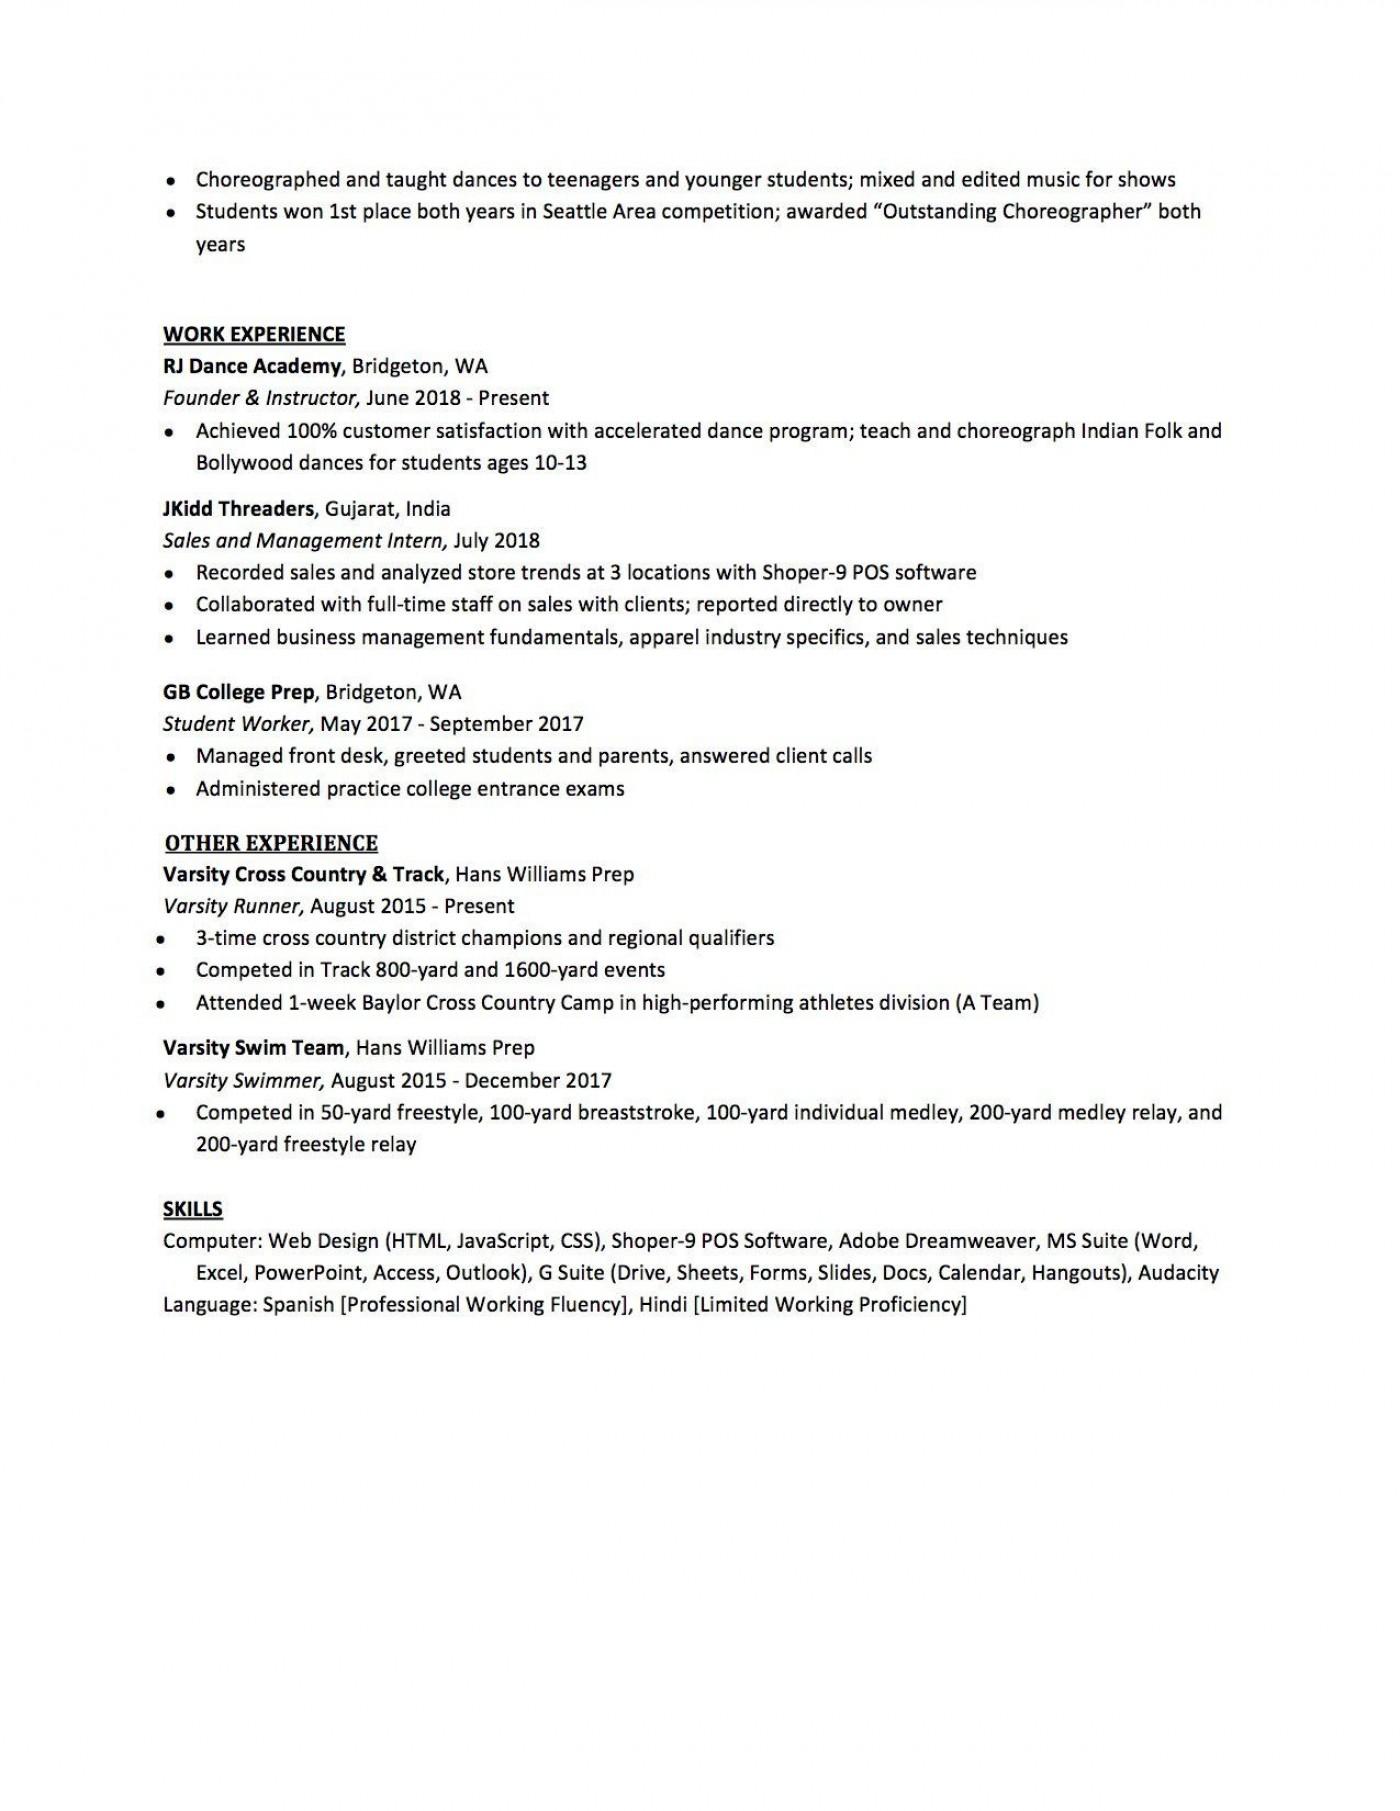 007 Sensational High School Student Resume Template Design  Free Google Doc1400